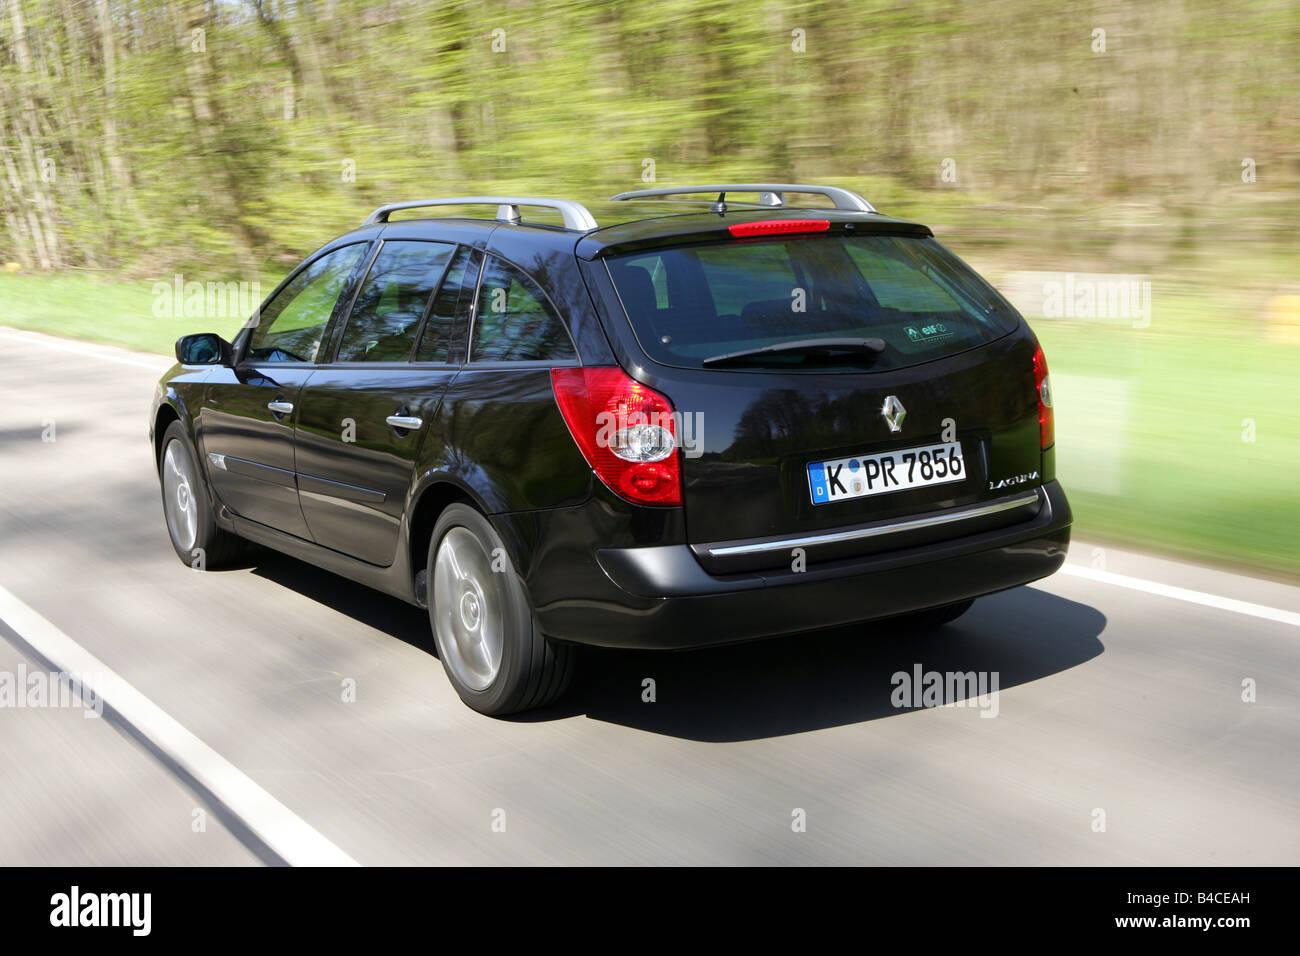 car renault laguna grandtour 2 0 hatchback model year 2005 stock photo royalty free image. Black Bedroom Furniture Sets. Home Design Ideas